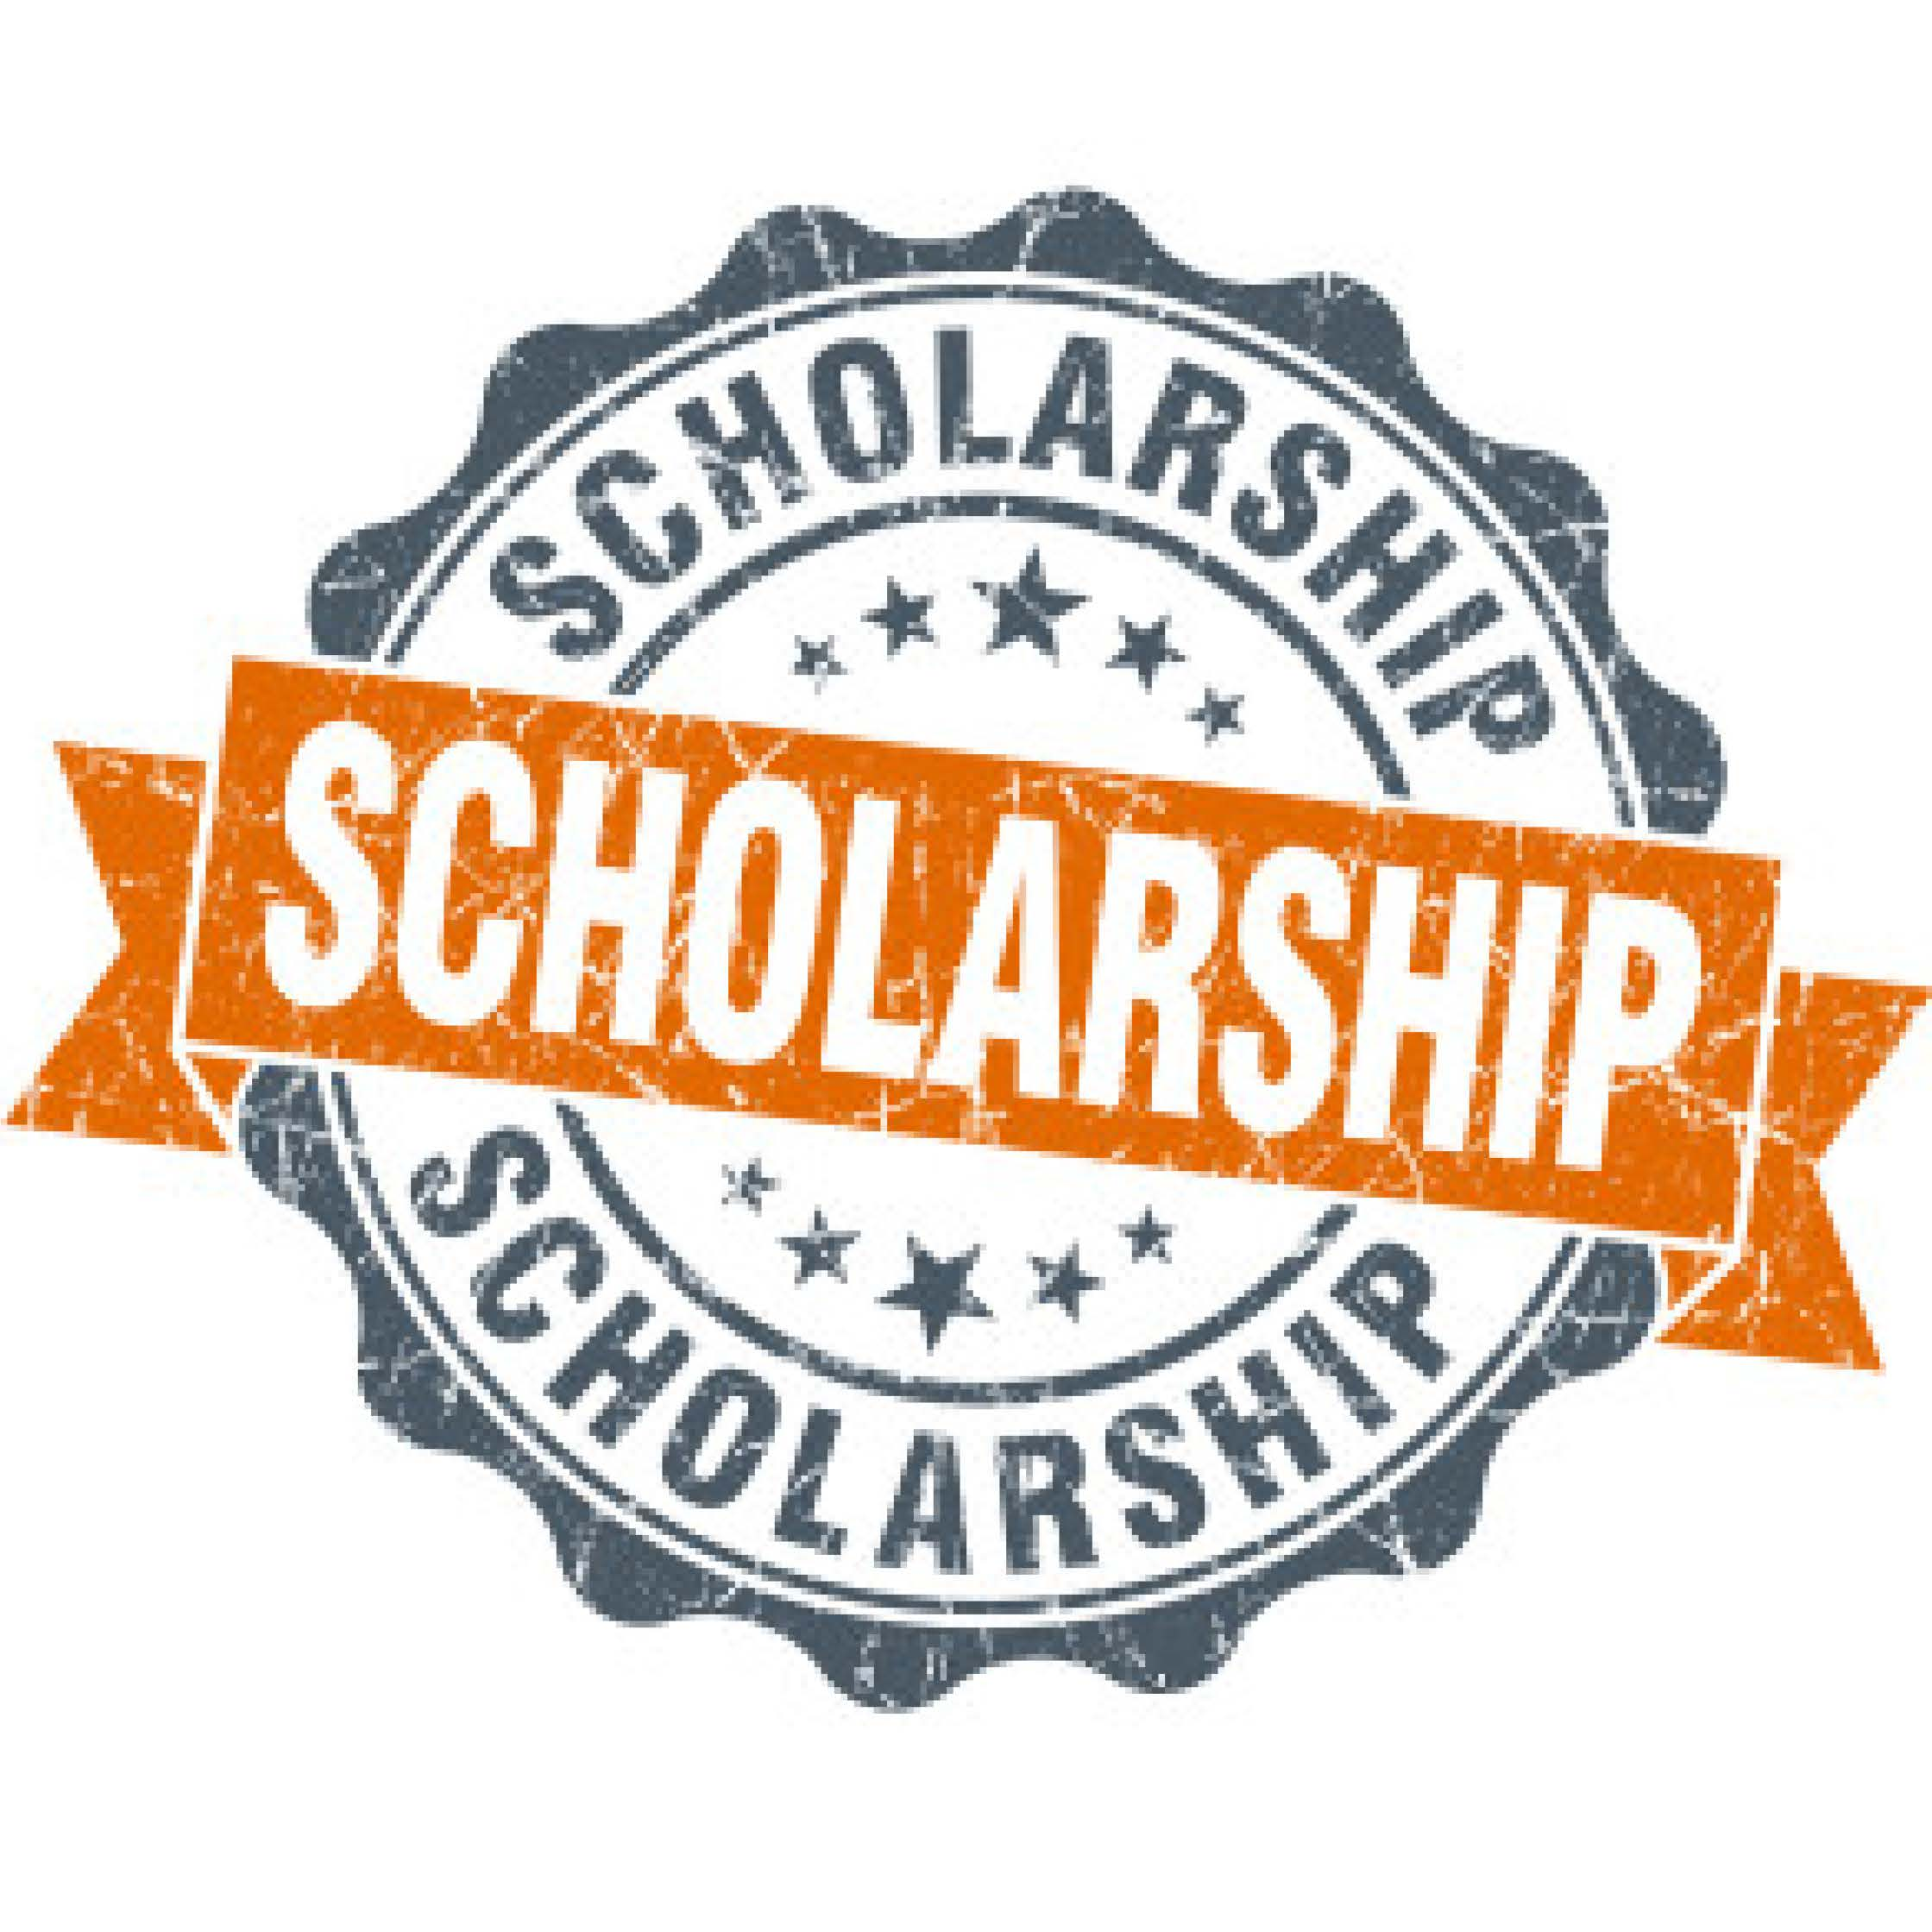 UPSES Scholarship